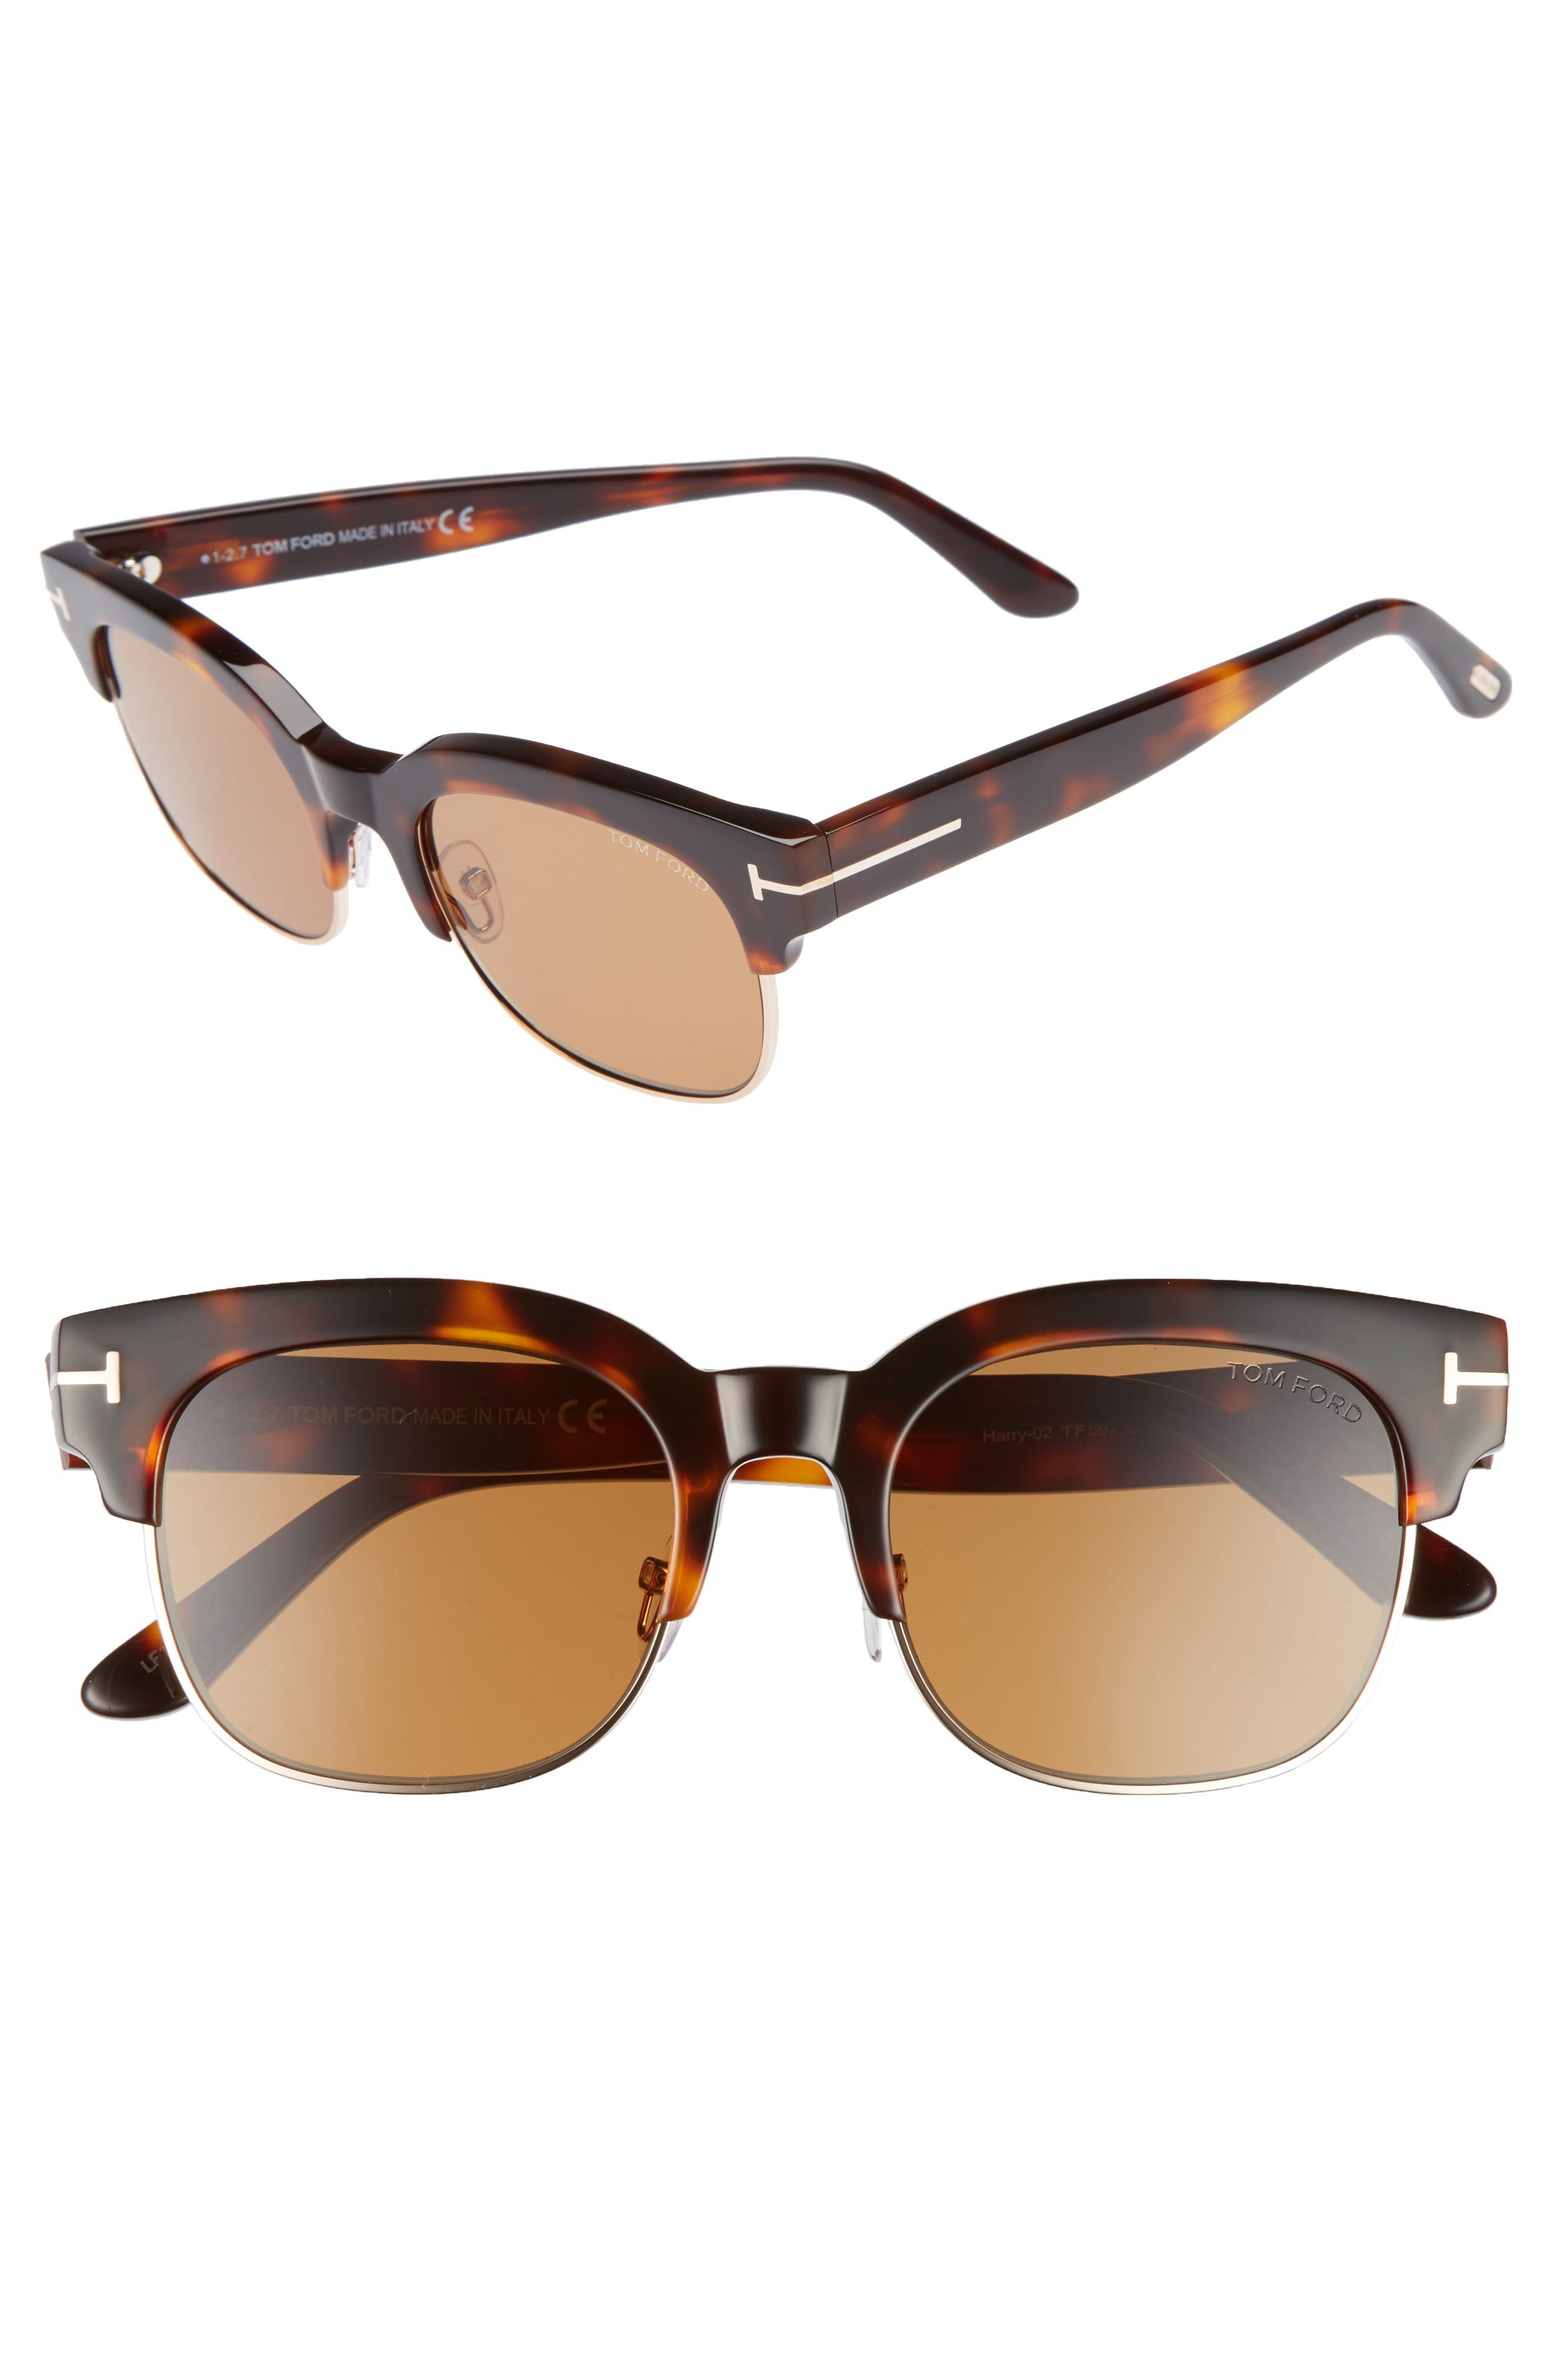 Tom Ford Harry 53mm Half-Rim Sunglasses